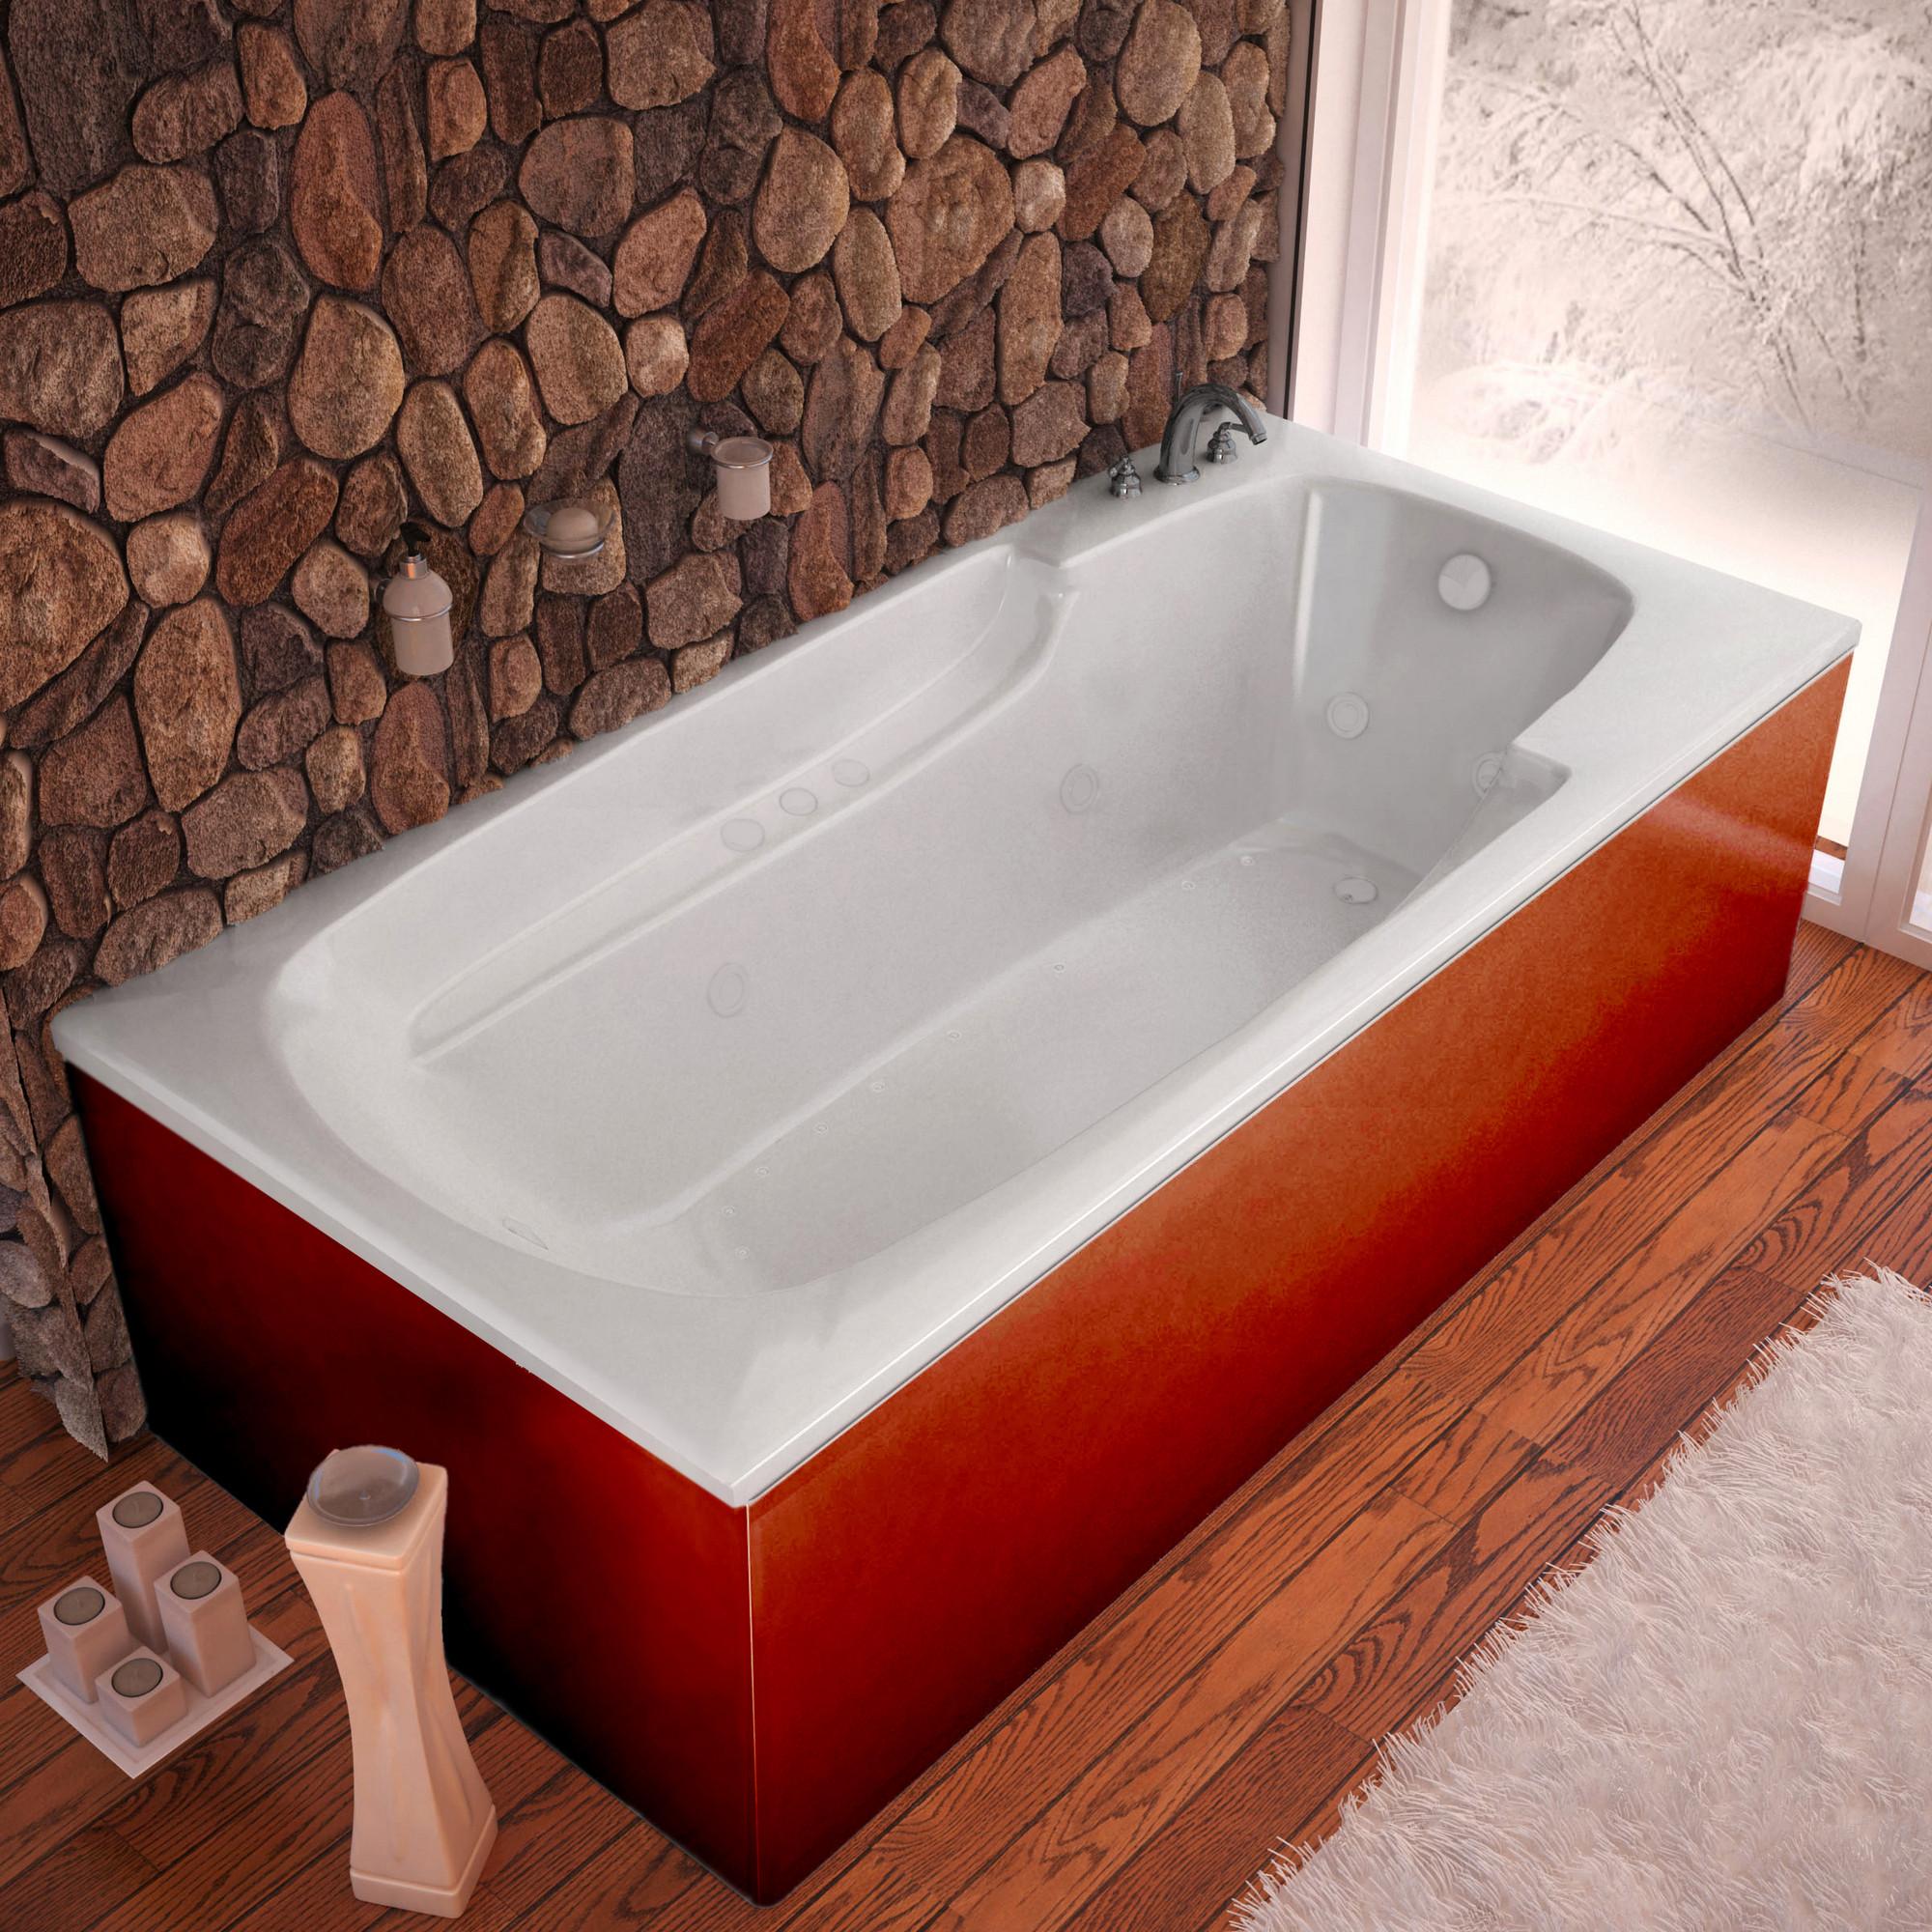 MediTub 3260EDL Eros Rectangular Air & Whirlpool Tub With Left Drain